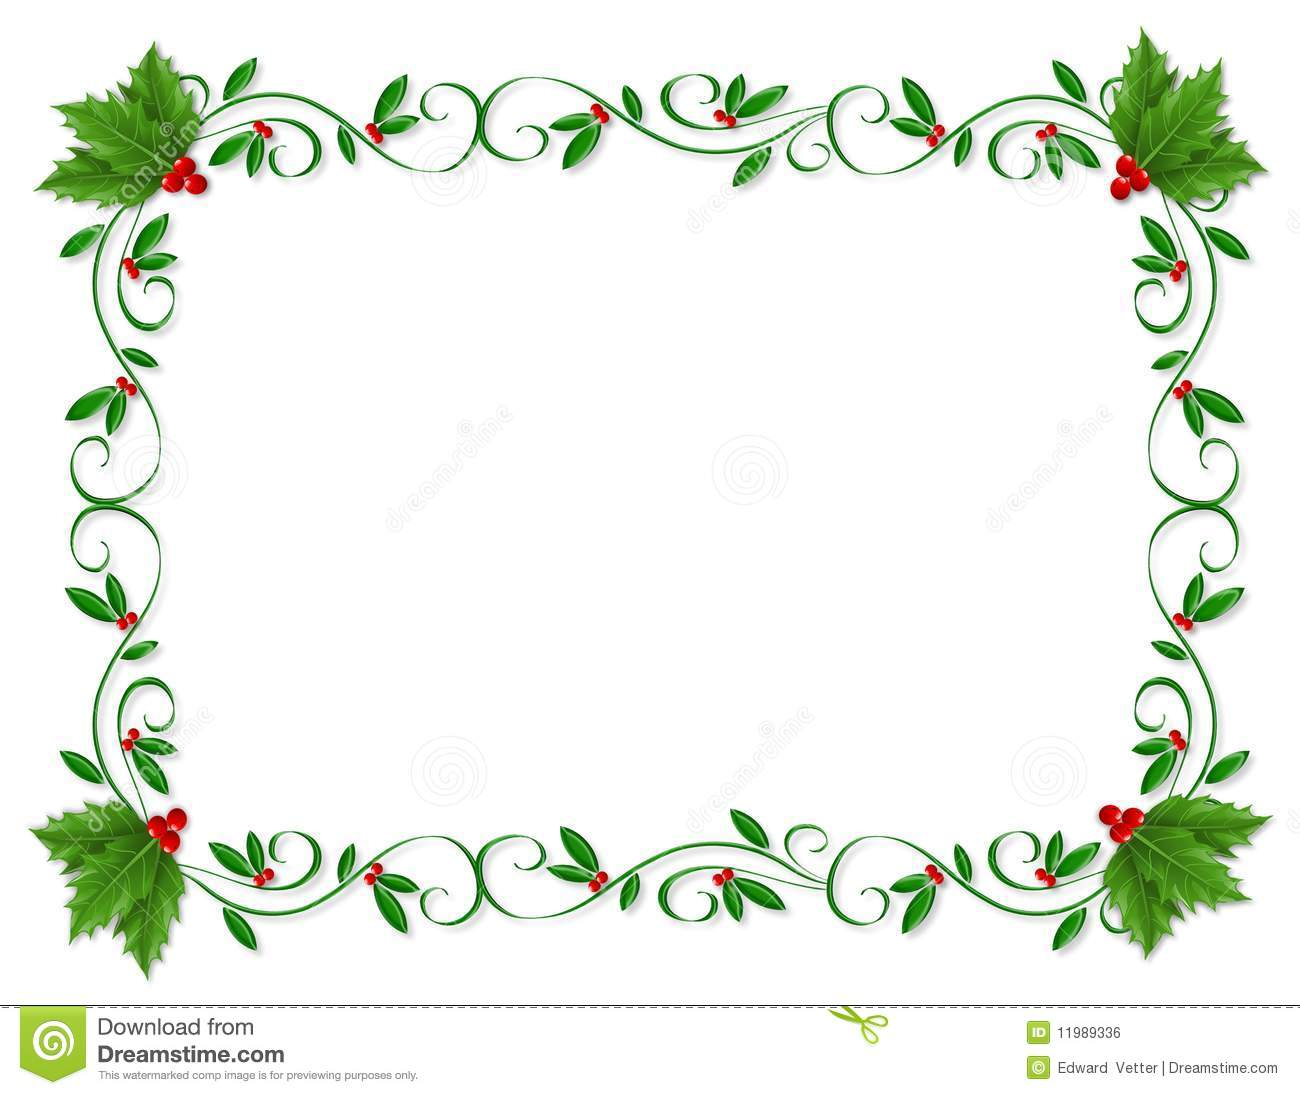 Christmas clip art borders .-Christmas clip art borders .-19